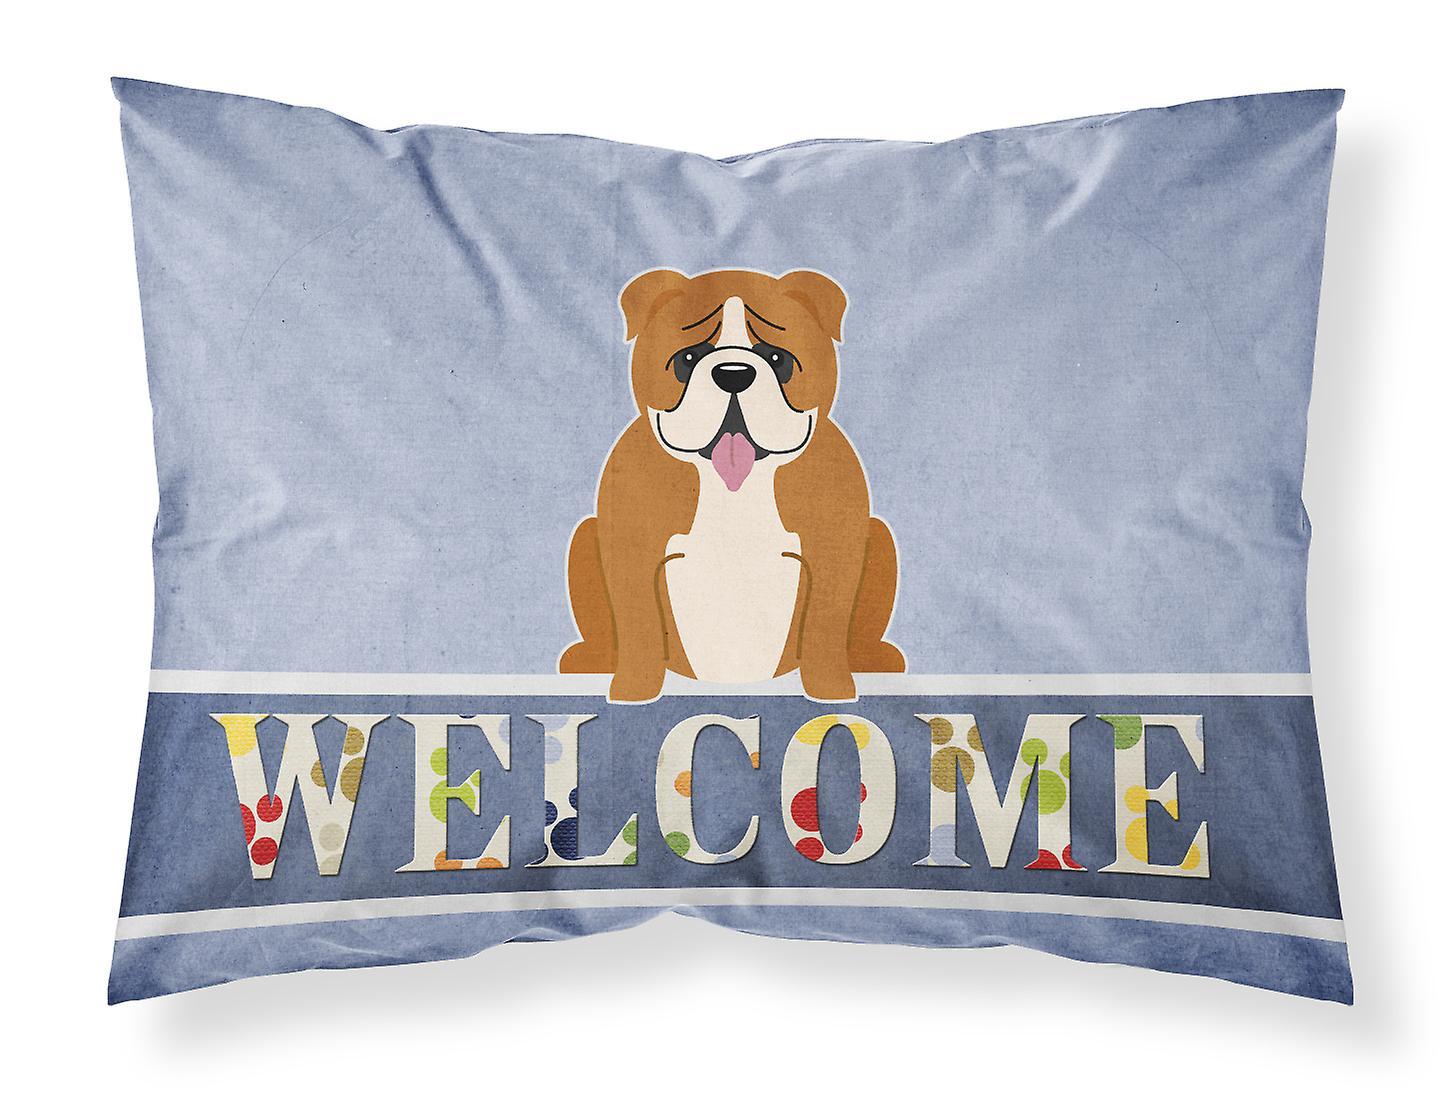 Taie Bienvenue Rouge D'oreiller Tissu Blanc Bulldog Standard Anglais YfI7b6gvy